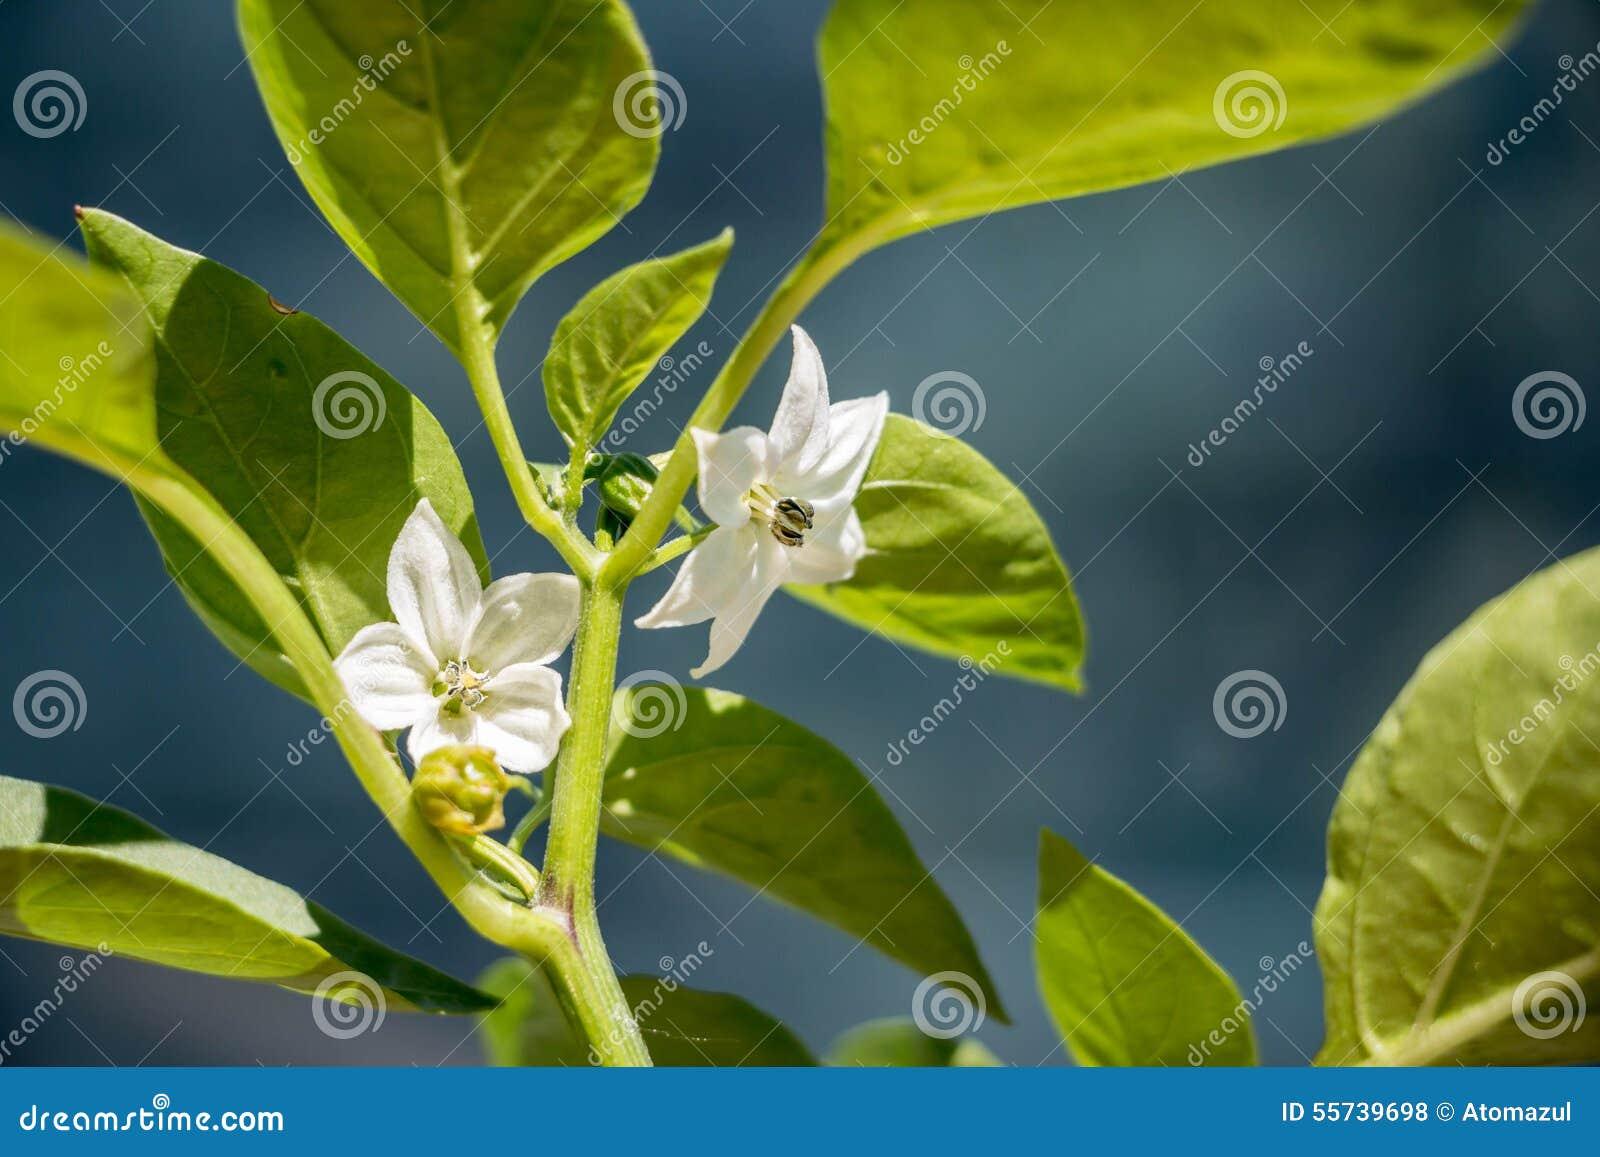 Цветок перец фото